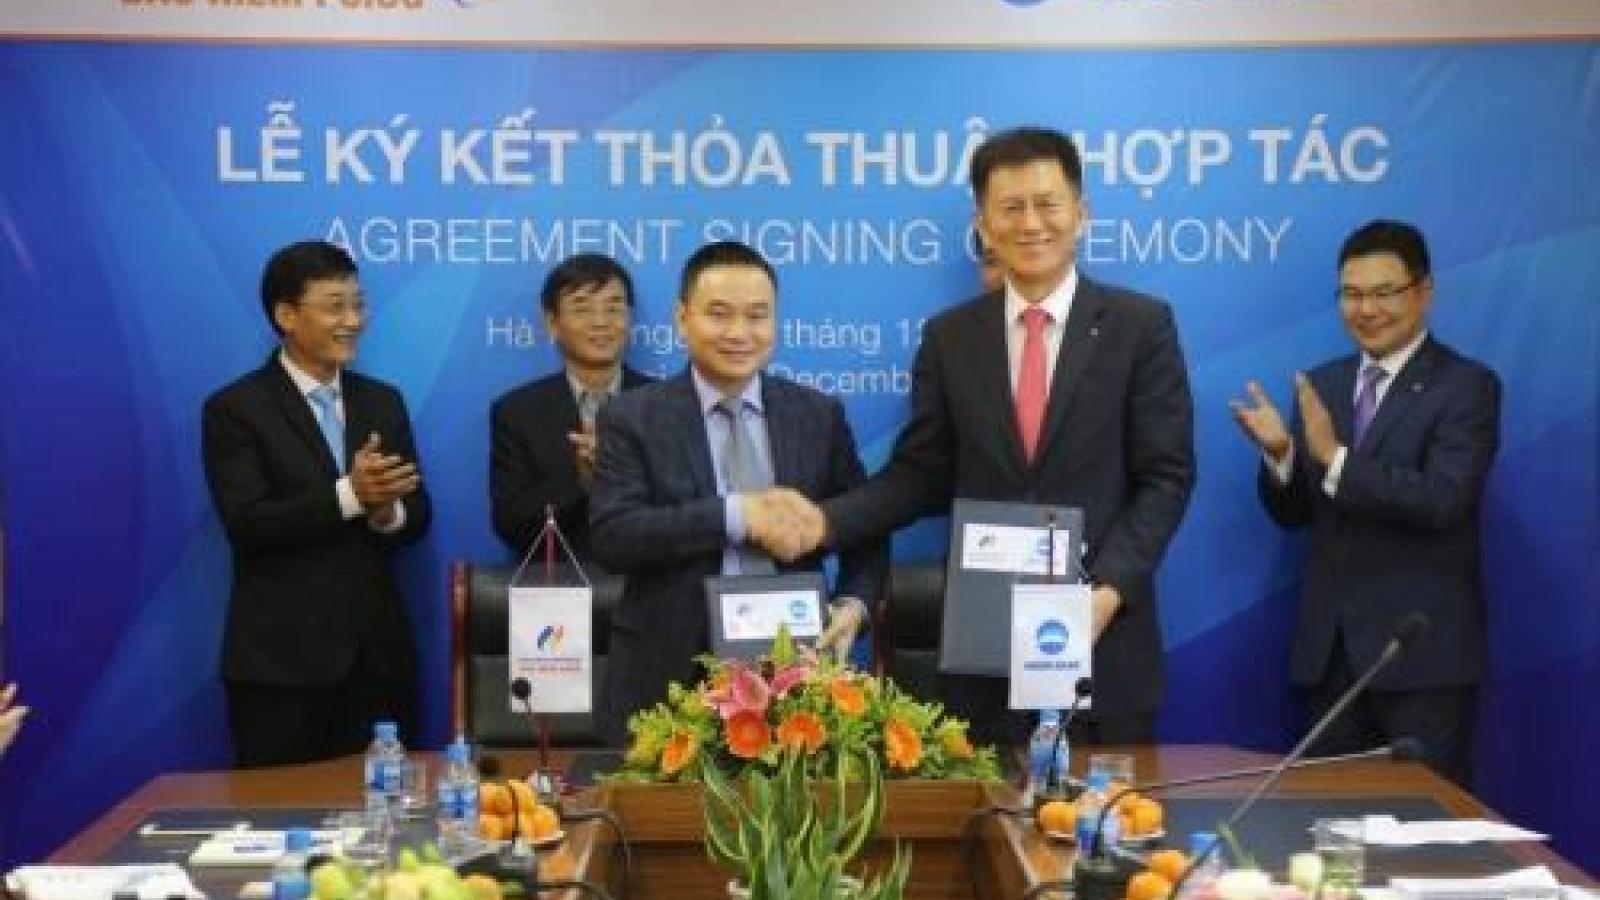 Vietnam non-life insurance company partners with Korean bank